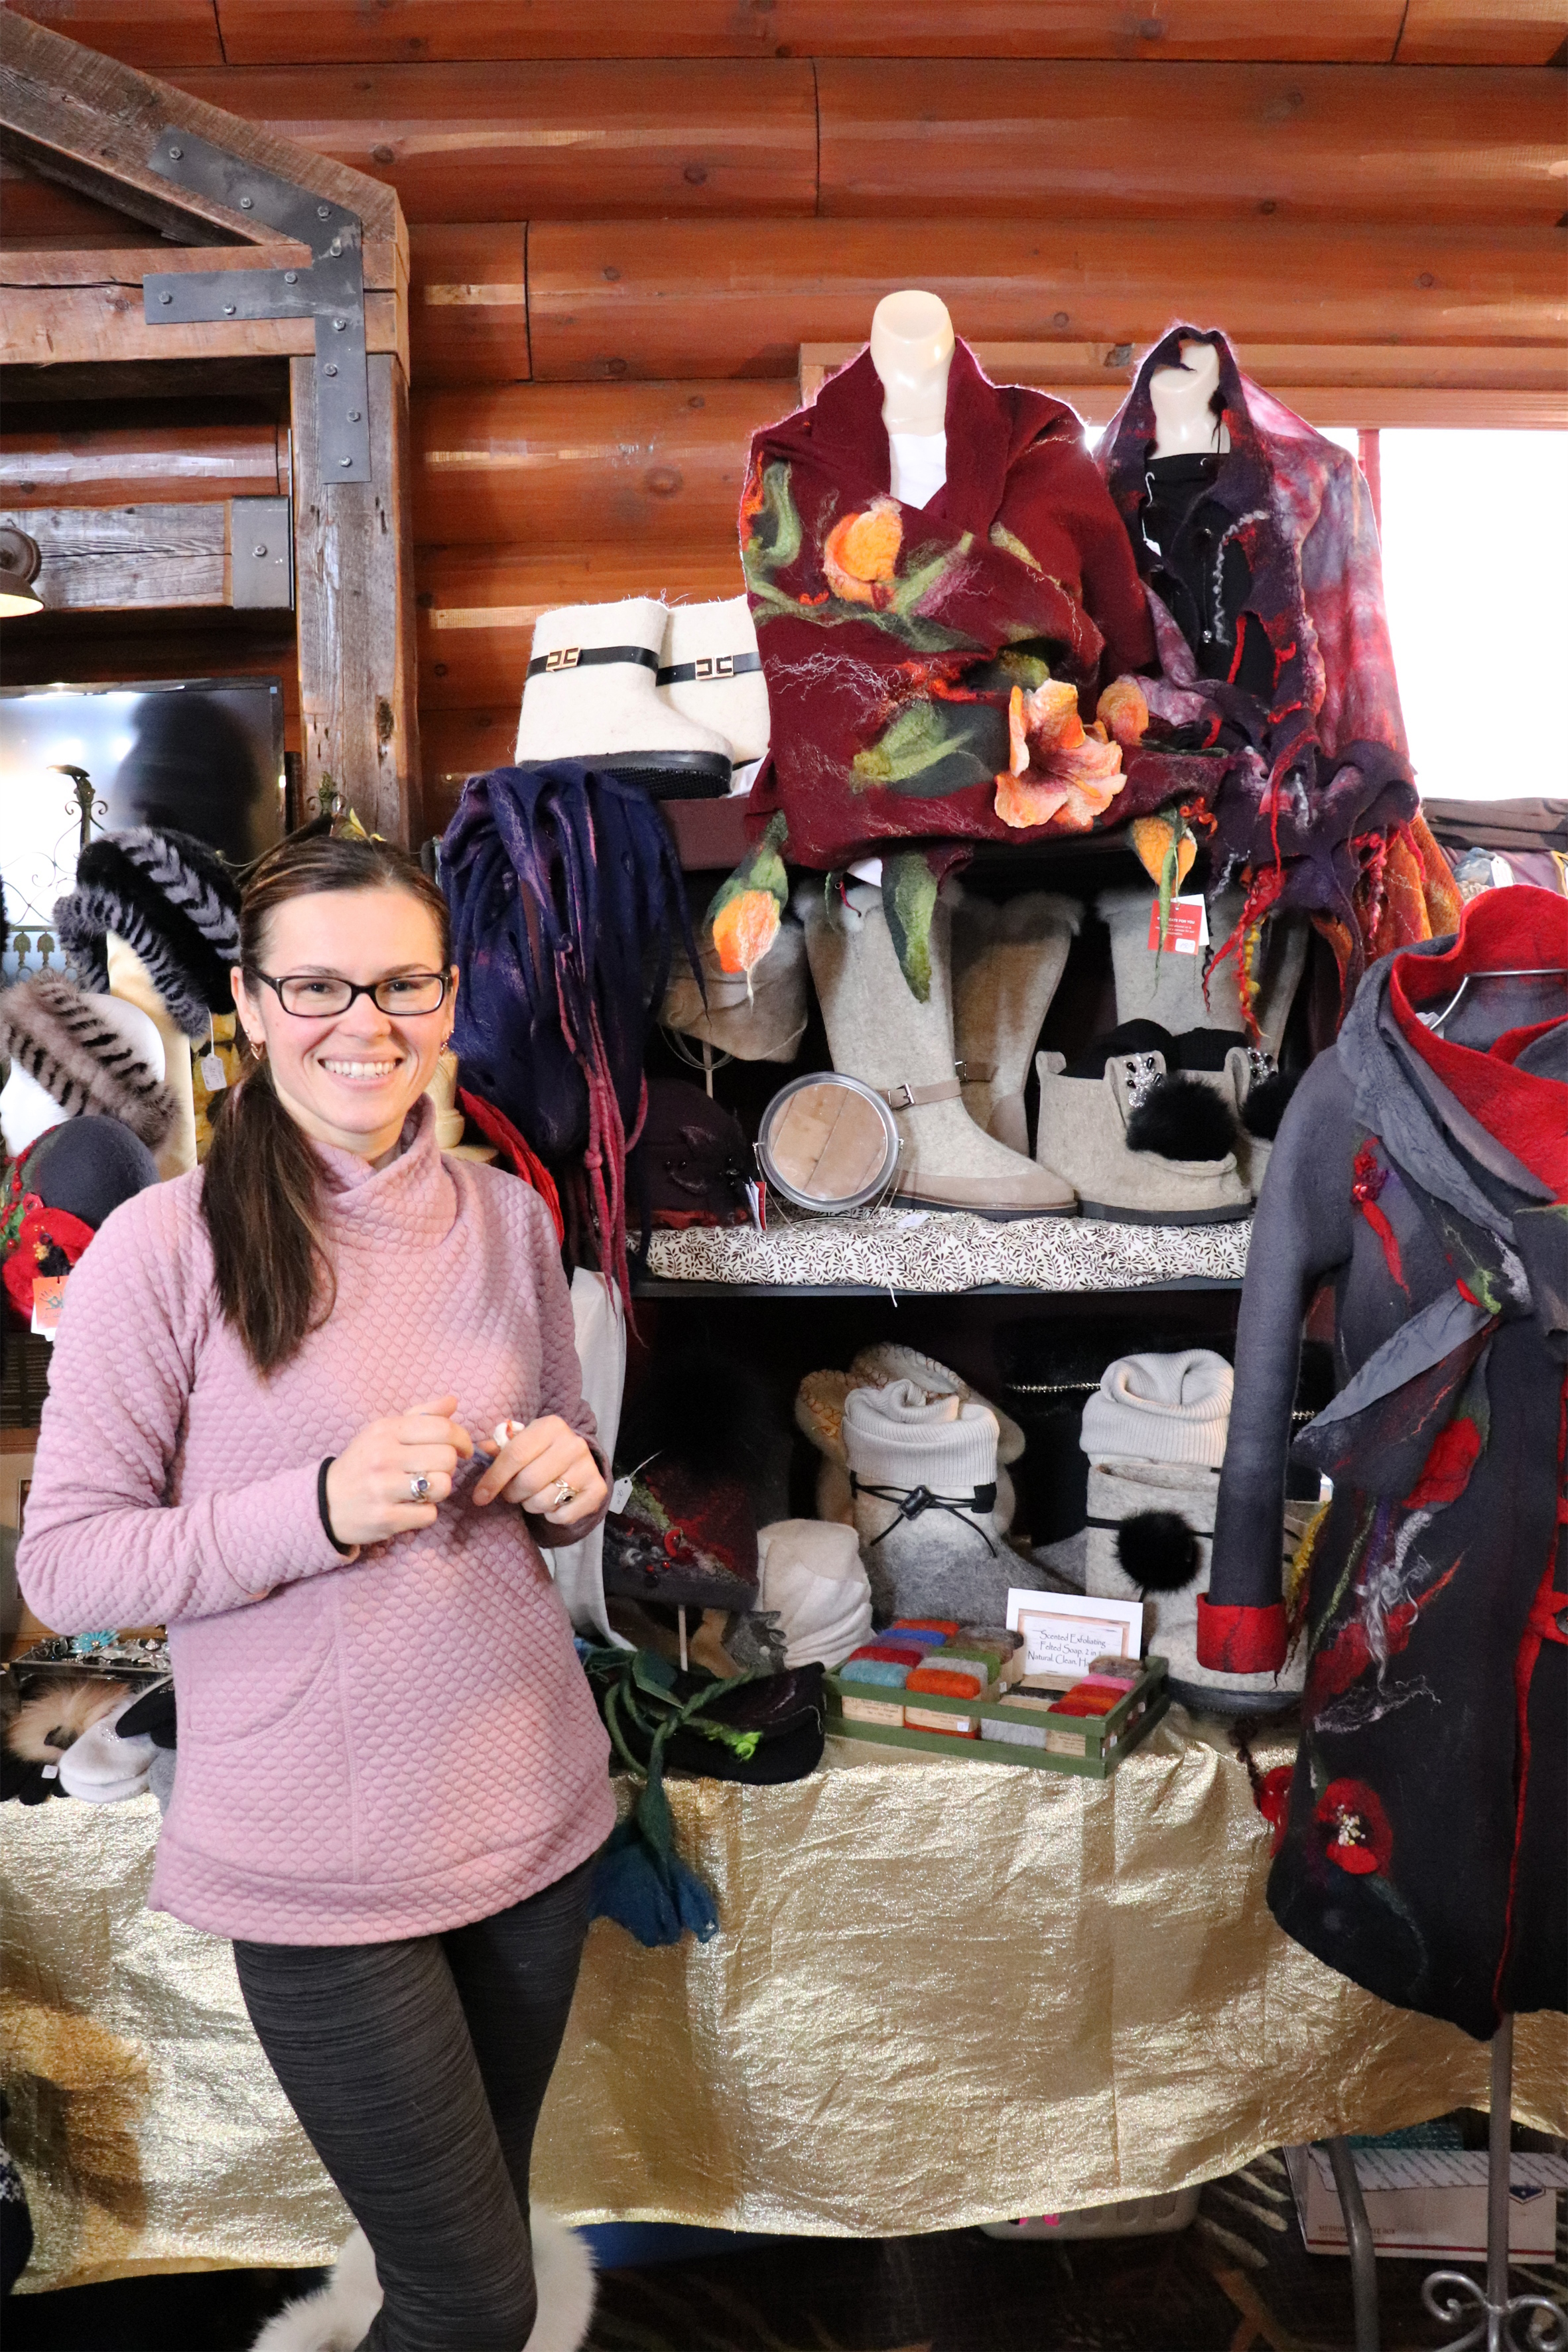 Irene shares her creations at the Holiday Market in Minocqua. Kim Johnson photo